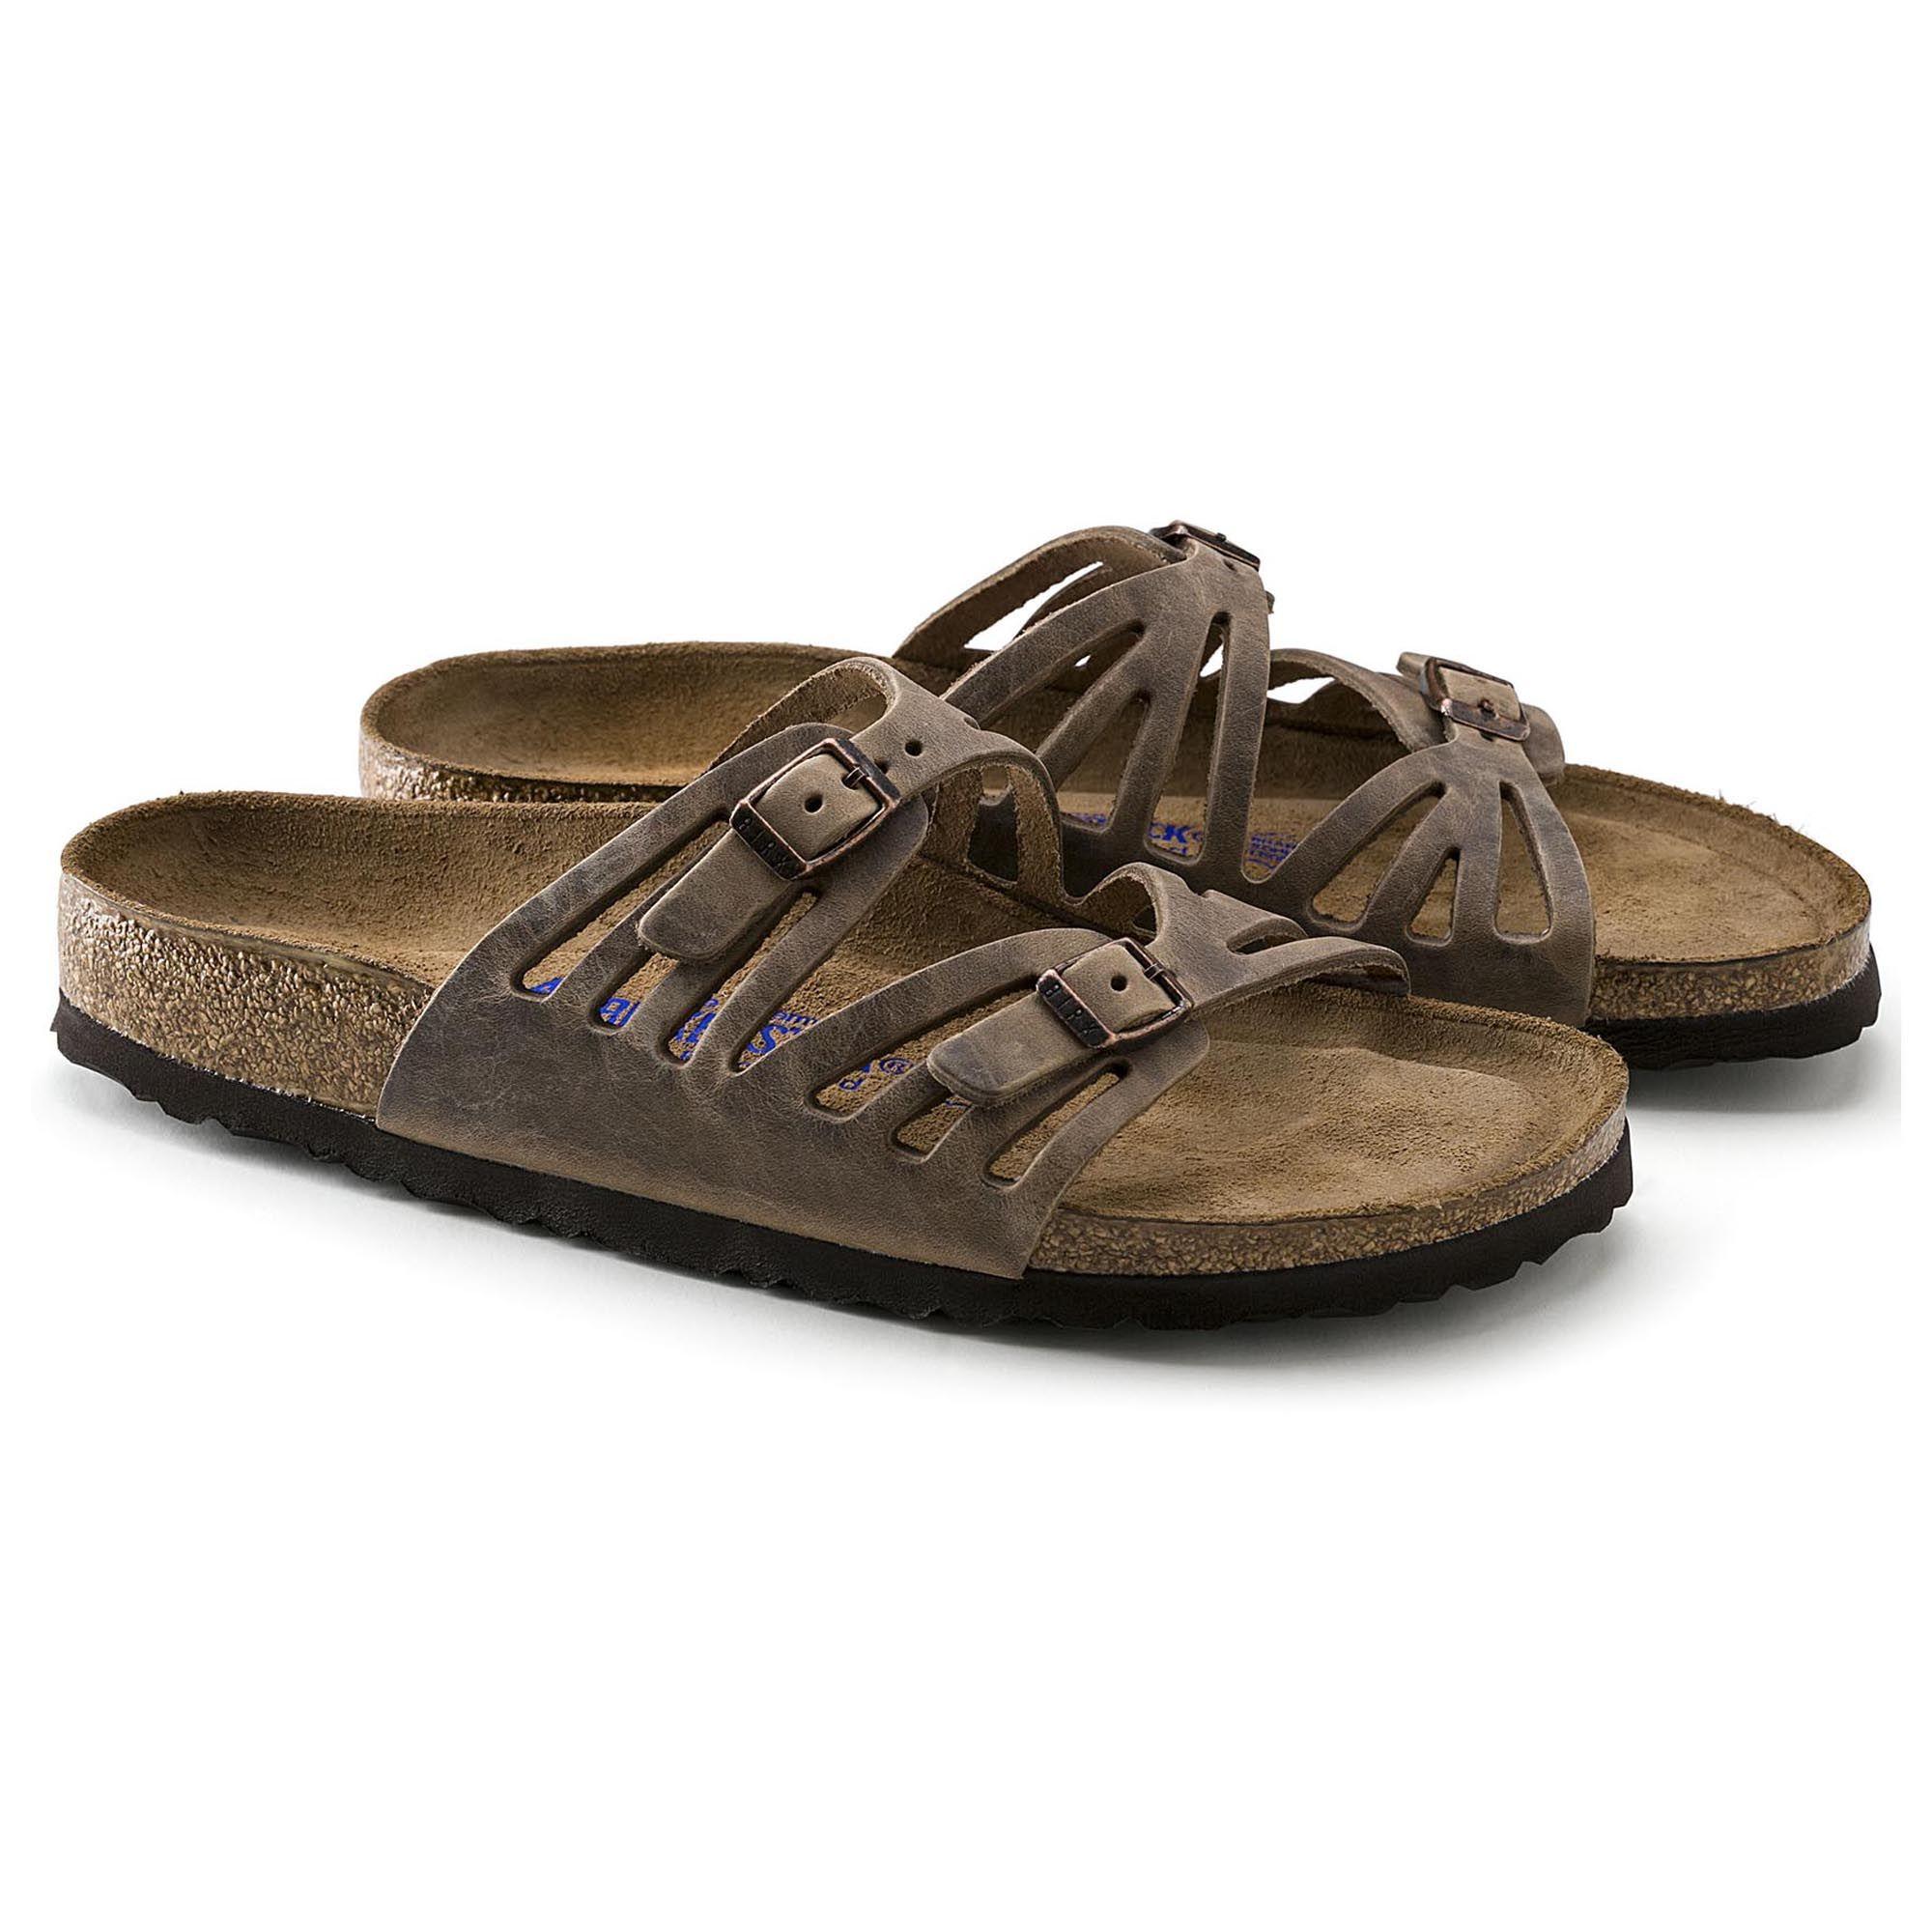 02251b48eb84b Granada Soft Footbed Tobacco Oiled Leather